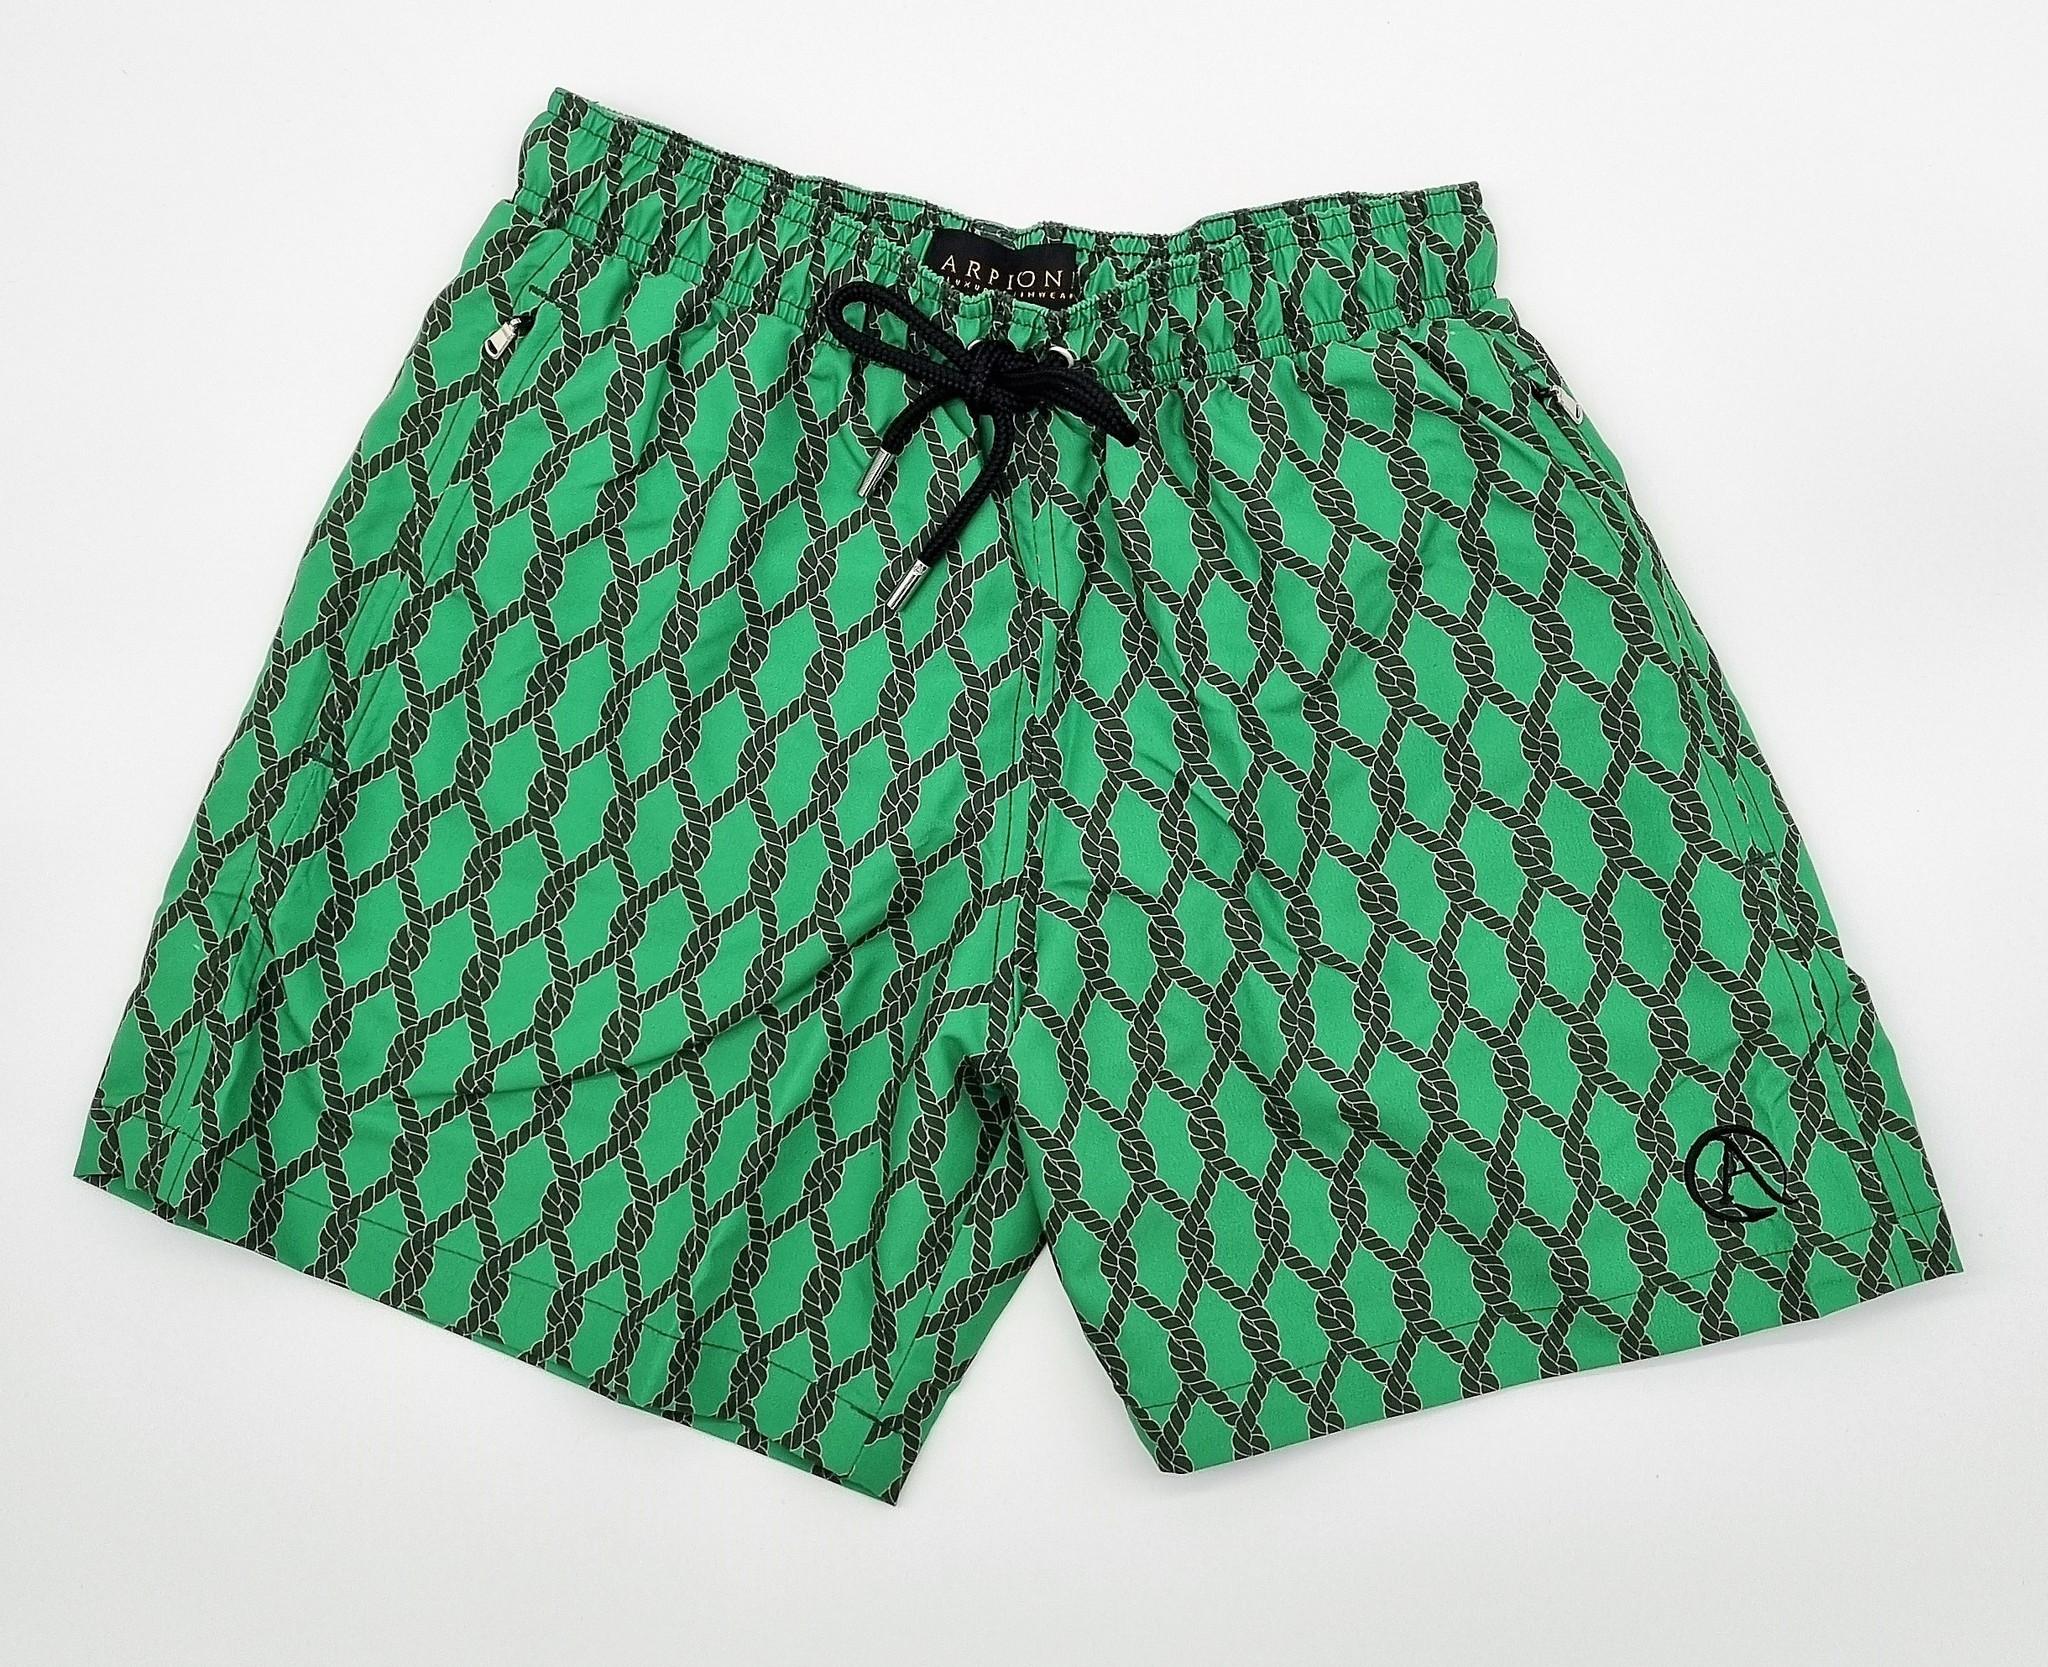 Arpione A luxury eco-friendly swimshort for men